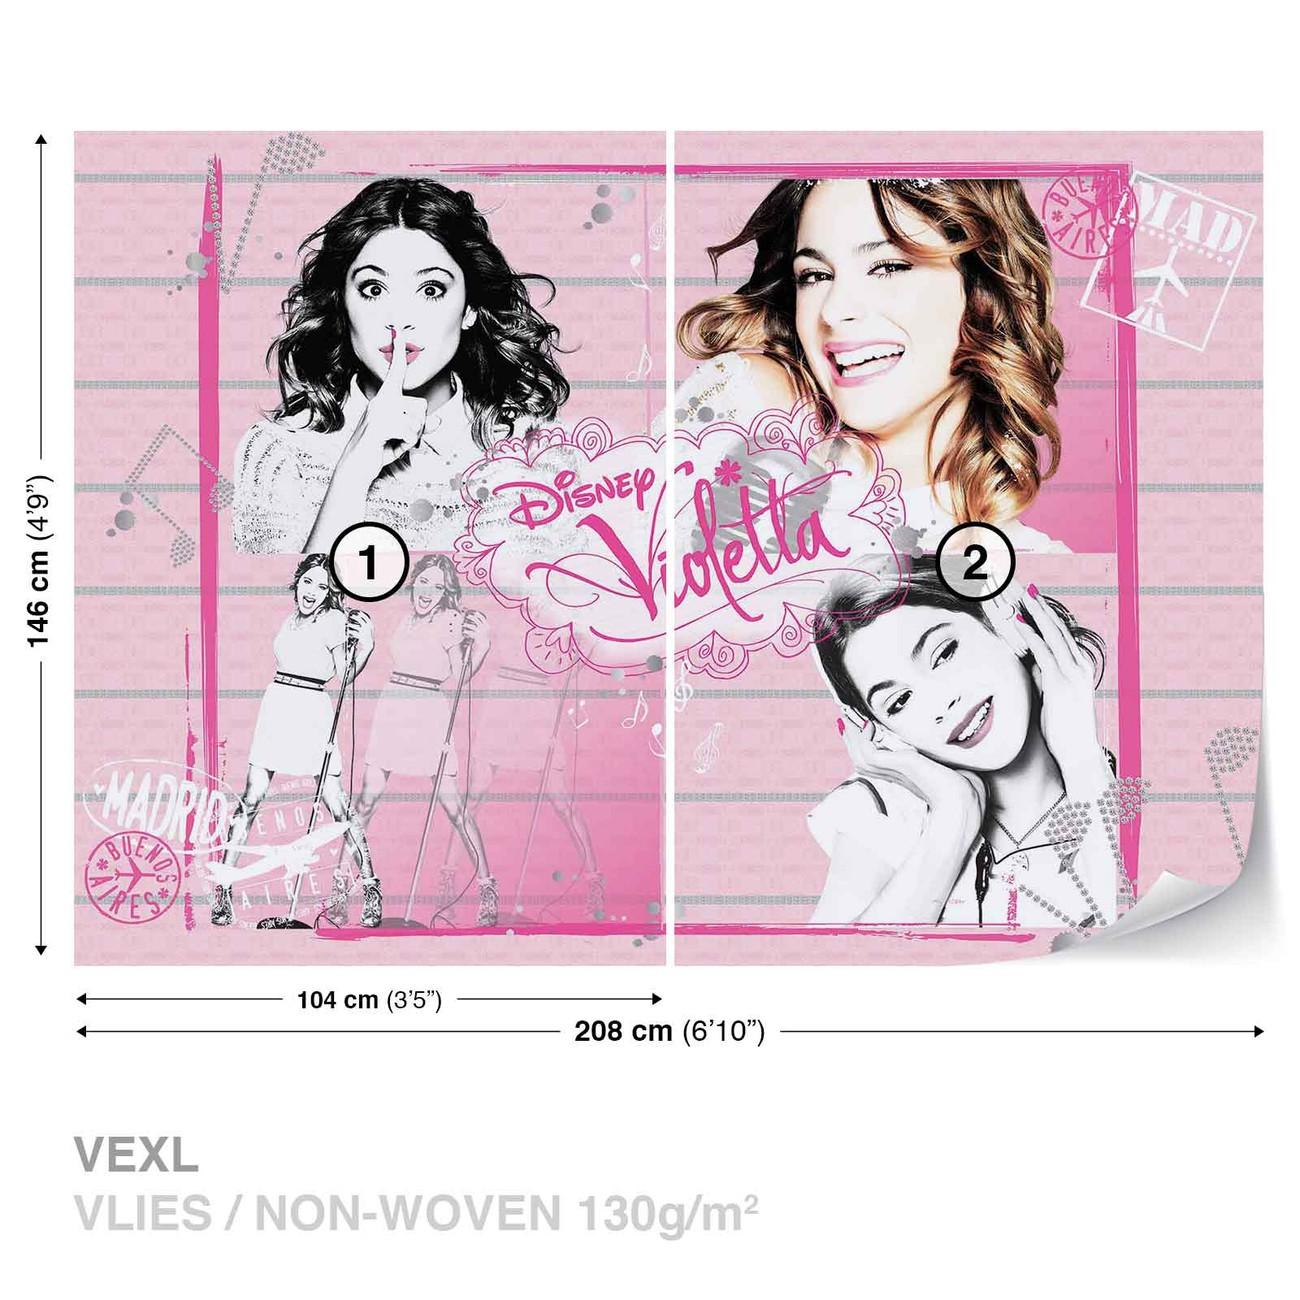 Disney Violetta Wall Paper Mural Buy at Abposterscom 1300x1300